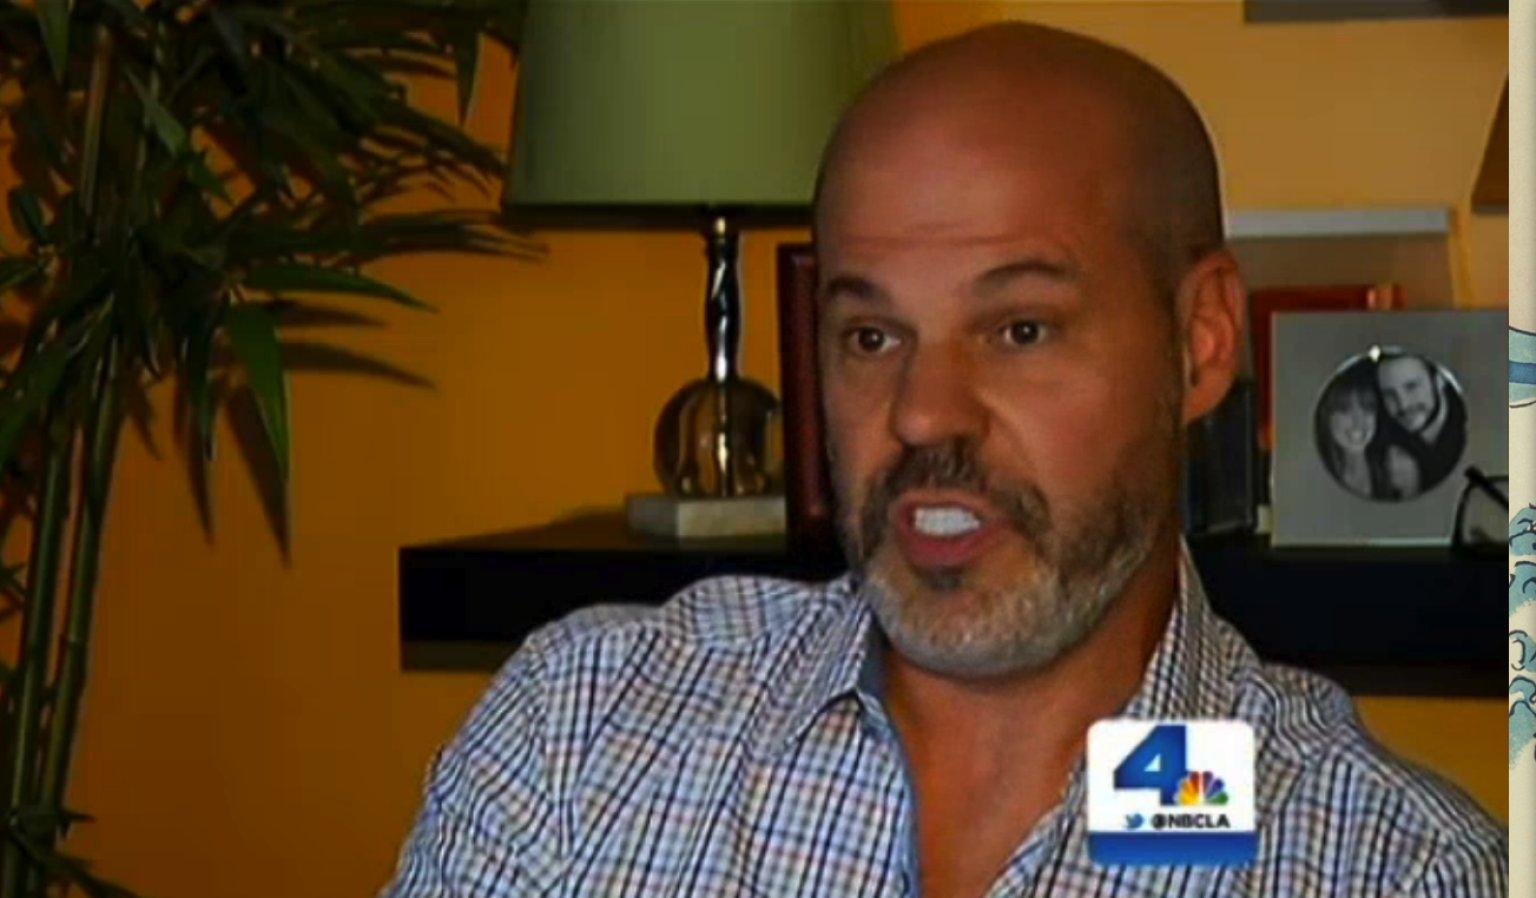 California court doctors treat gays